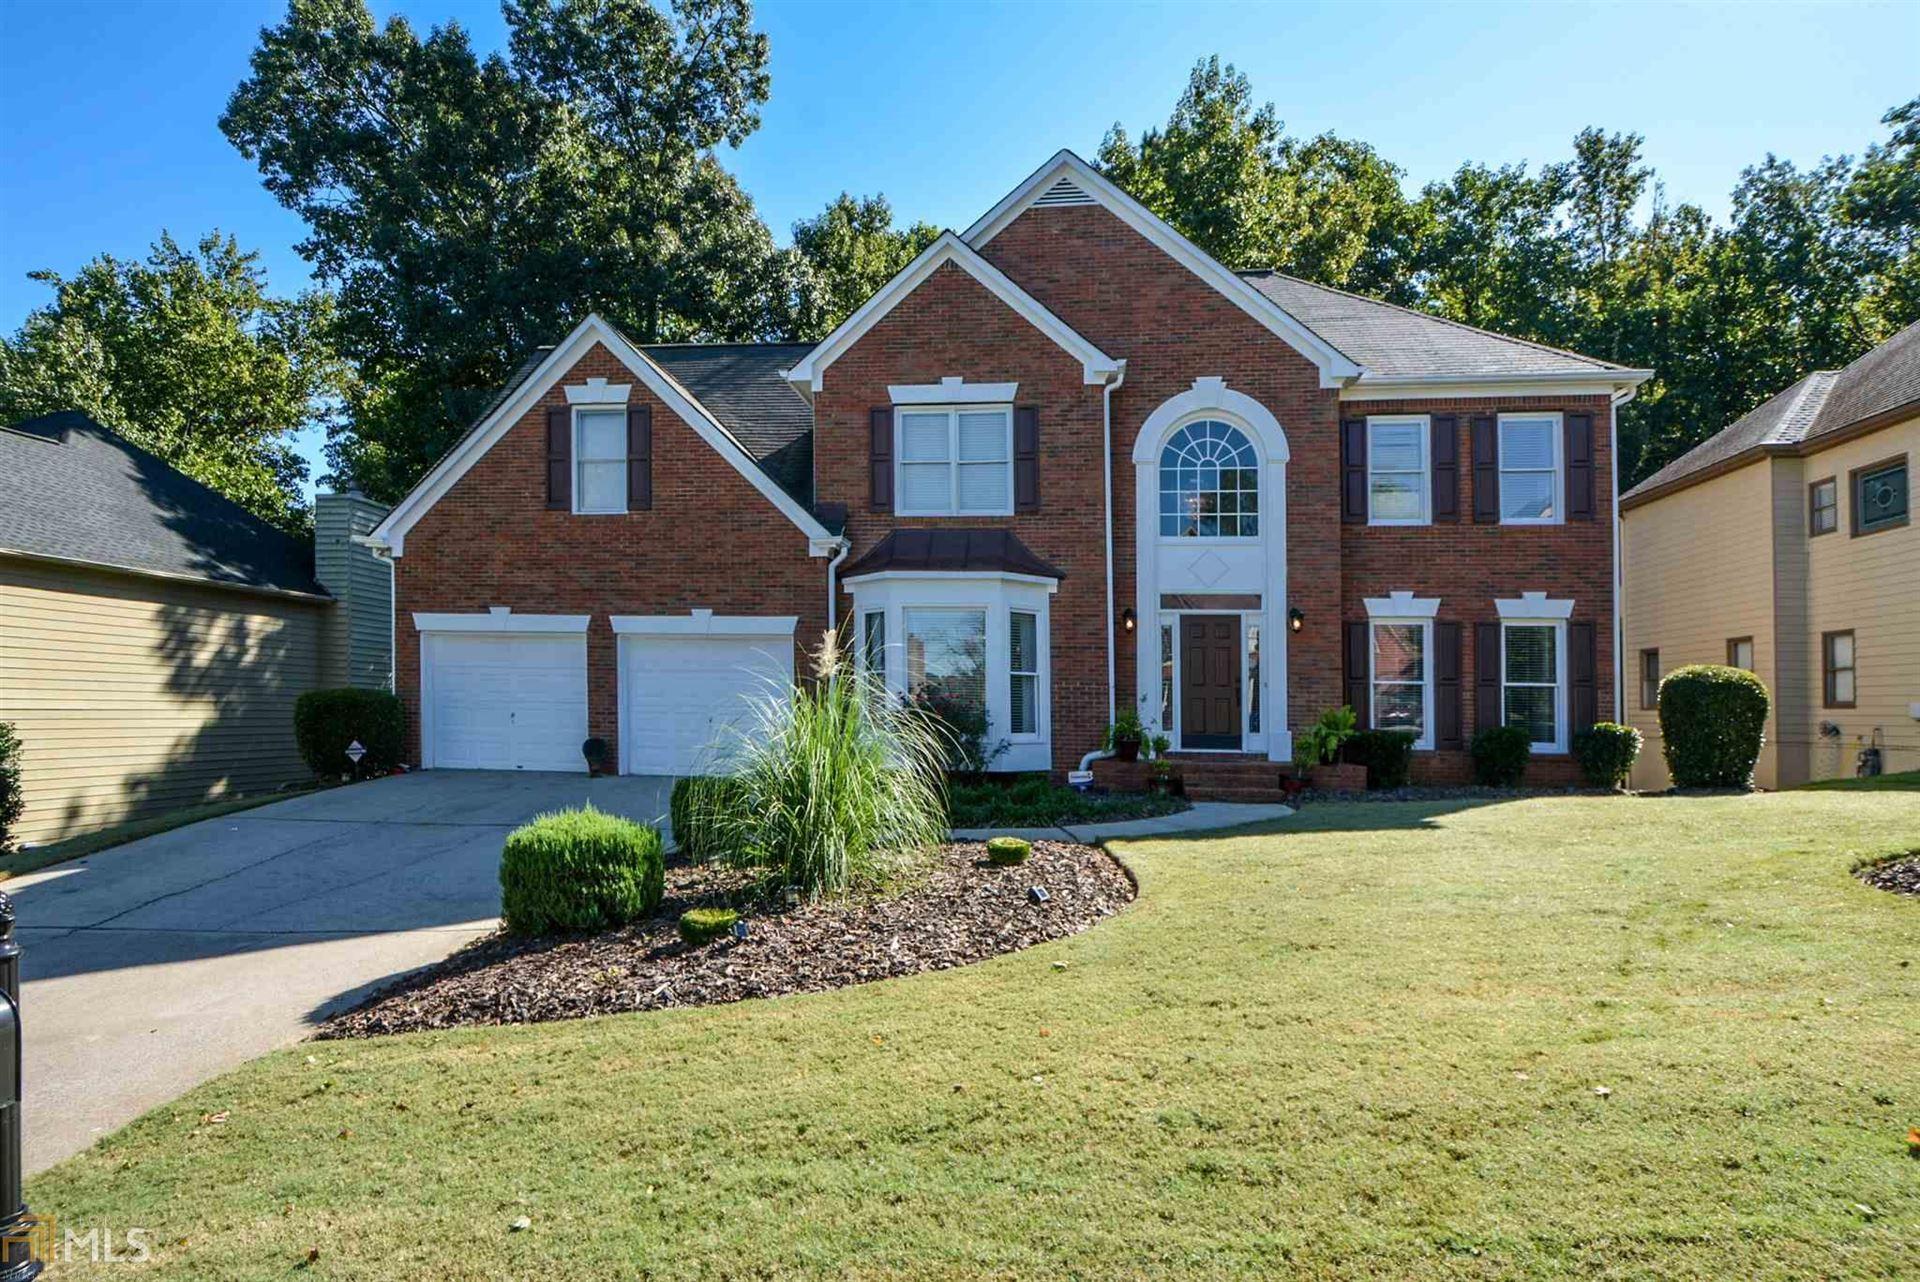 7066 Hunters Ridge, Woodstock, GA 30189 - MLS#: 8870538